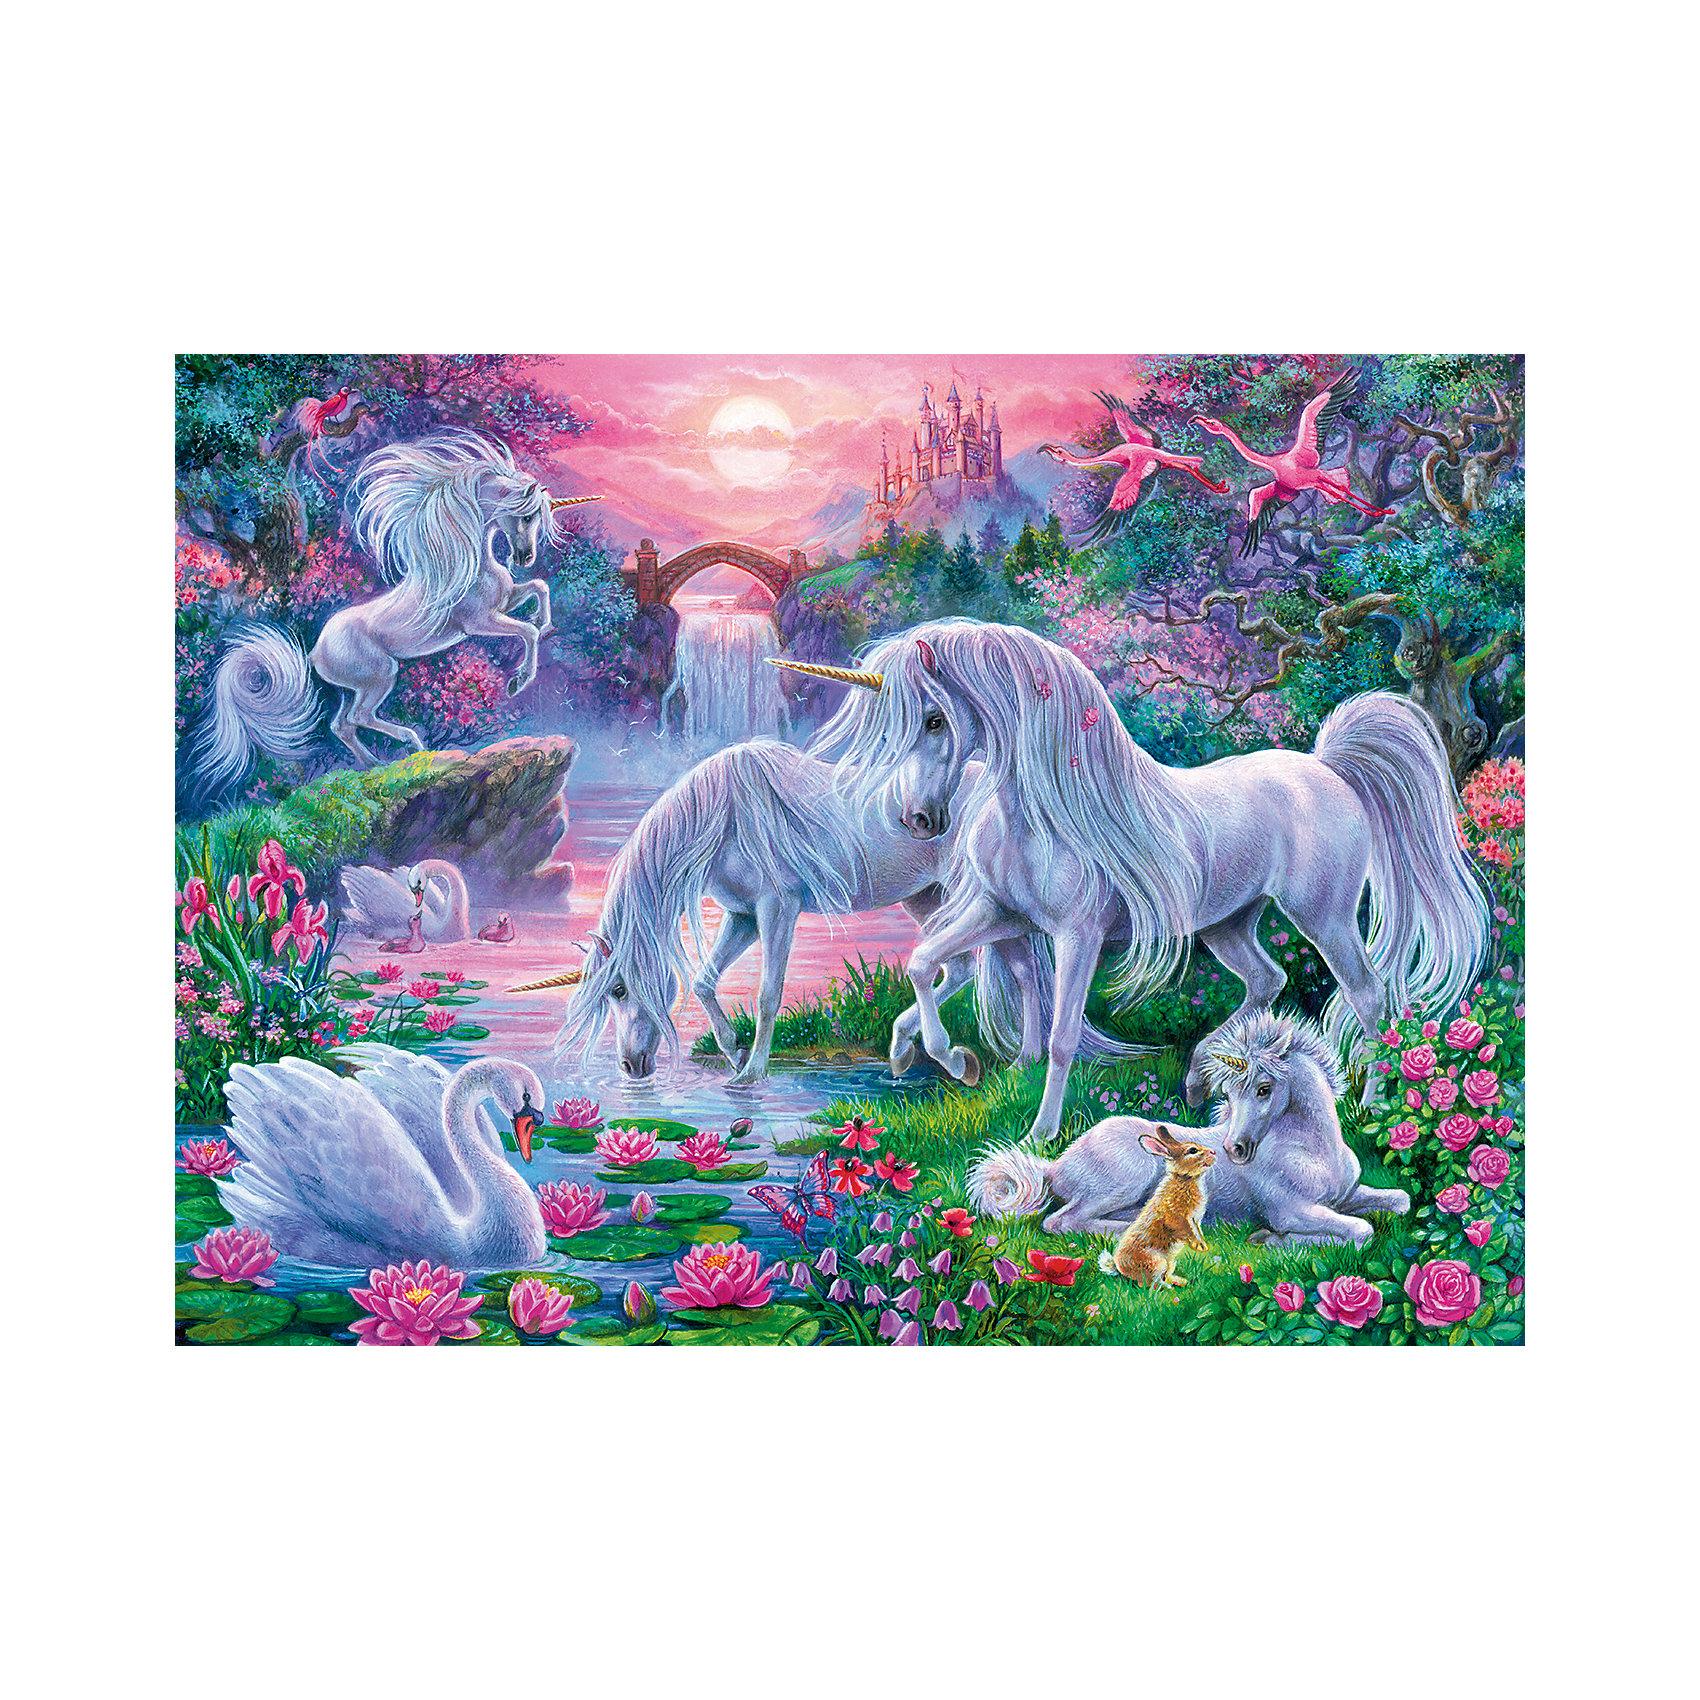 Пазл «Волшебное королевство» XXL 150 шт от myToys